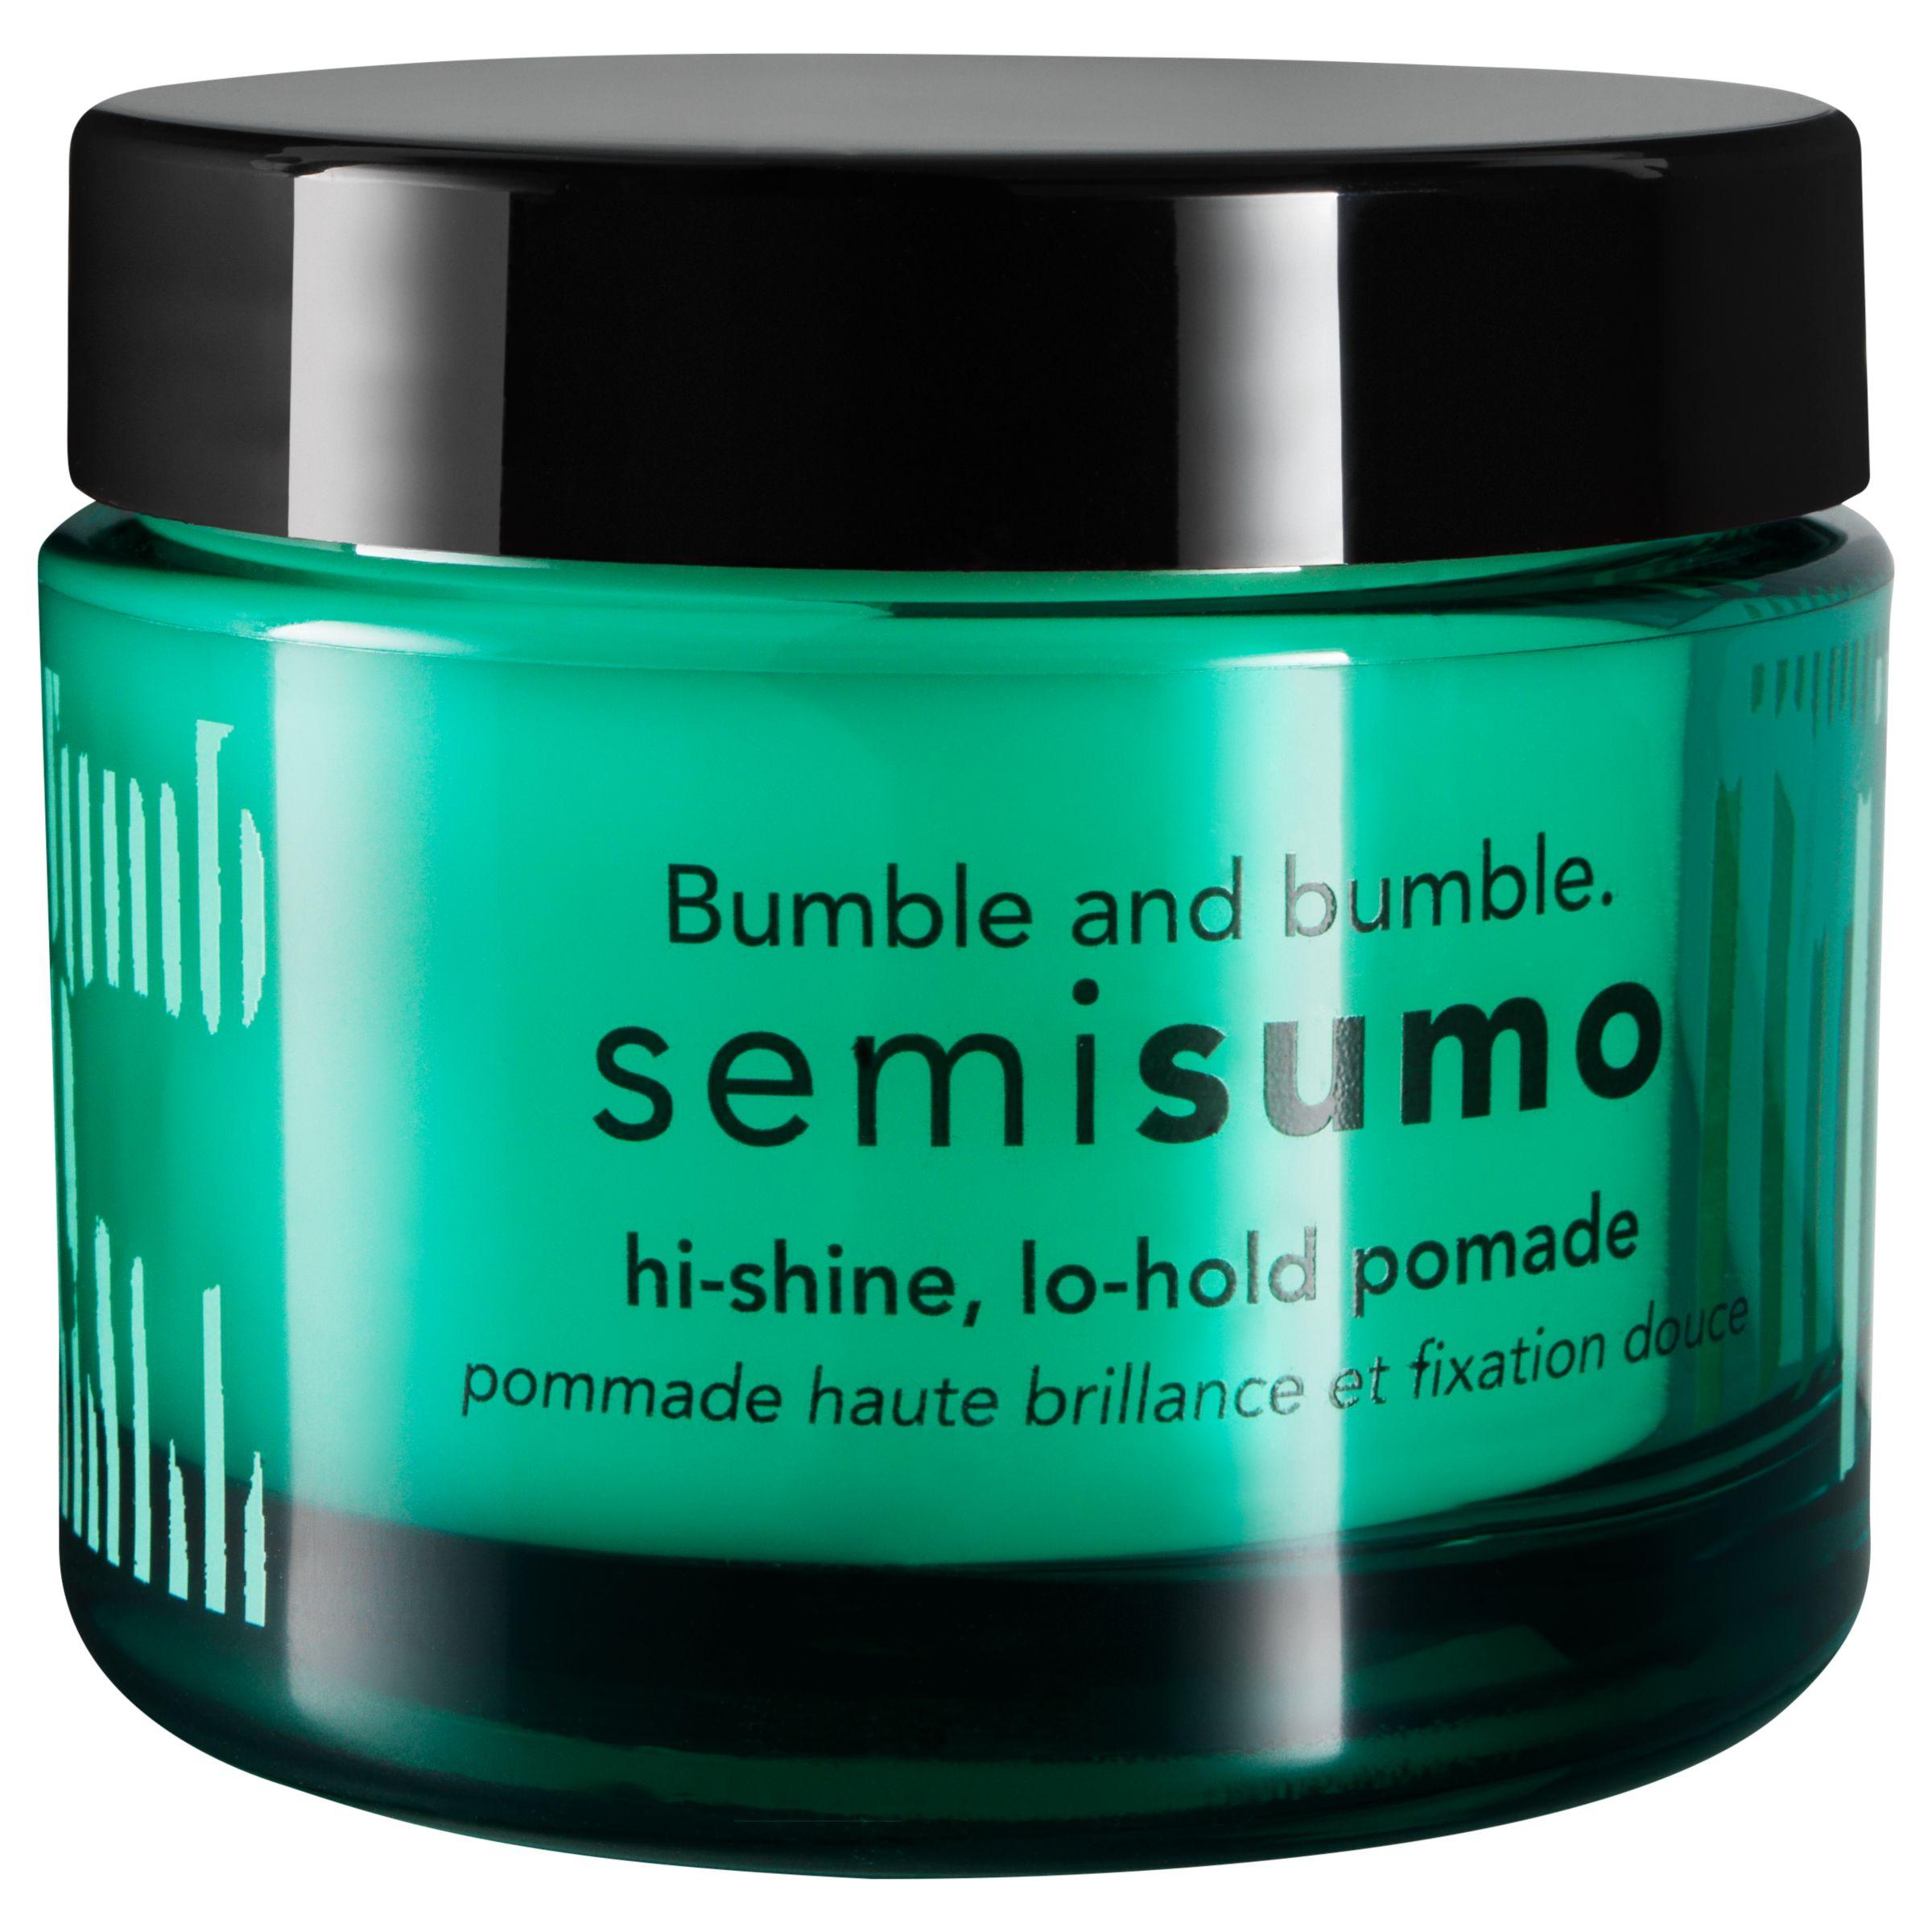 Bumble and bumble Bumble and bumble Semi Sumo Pomade, 50ml